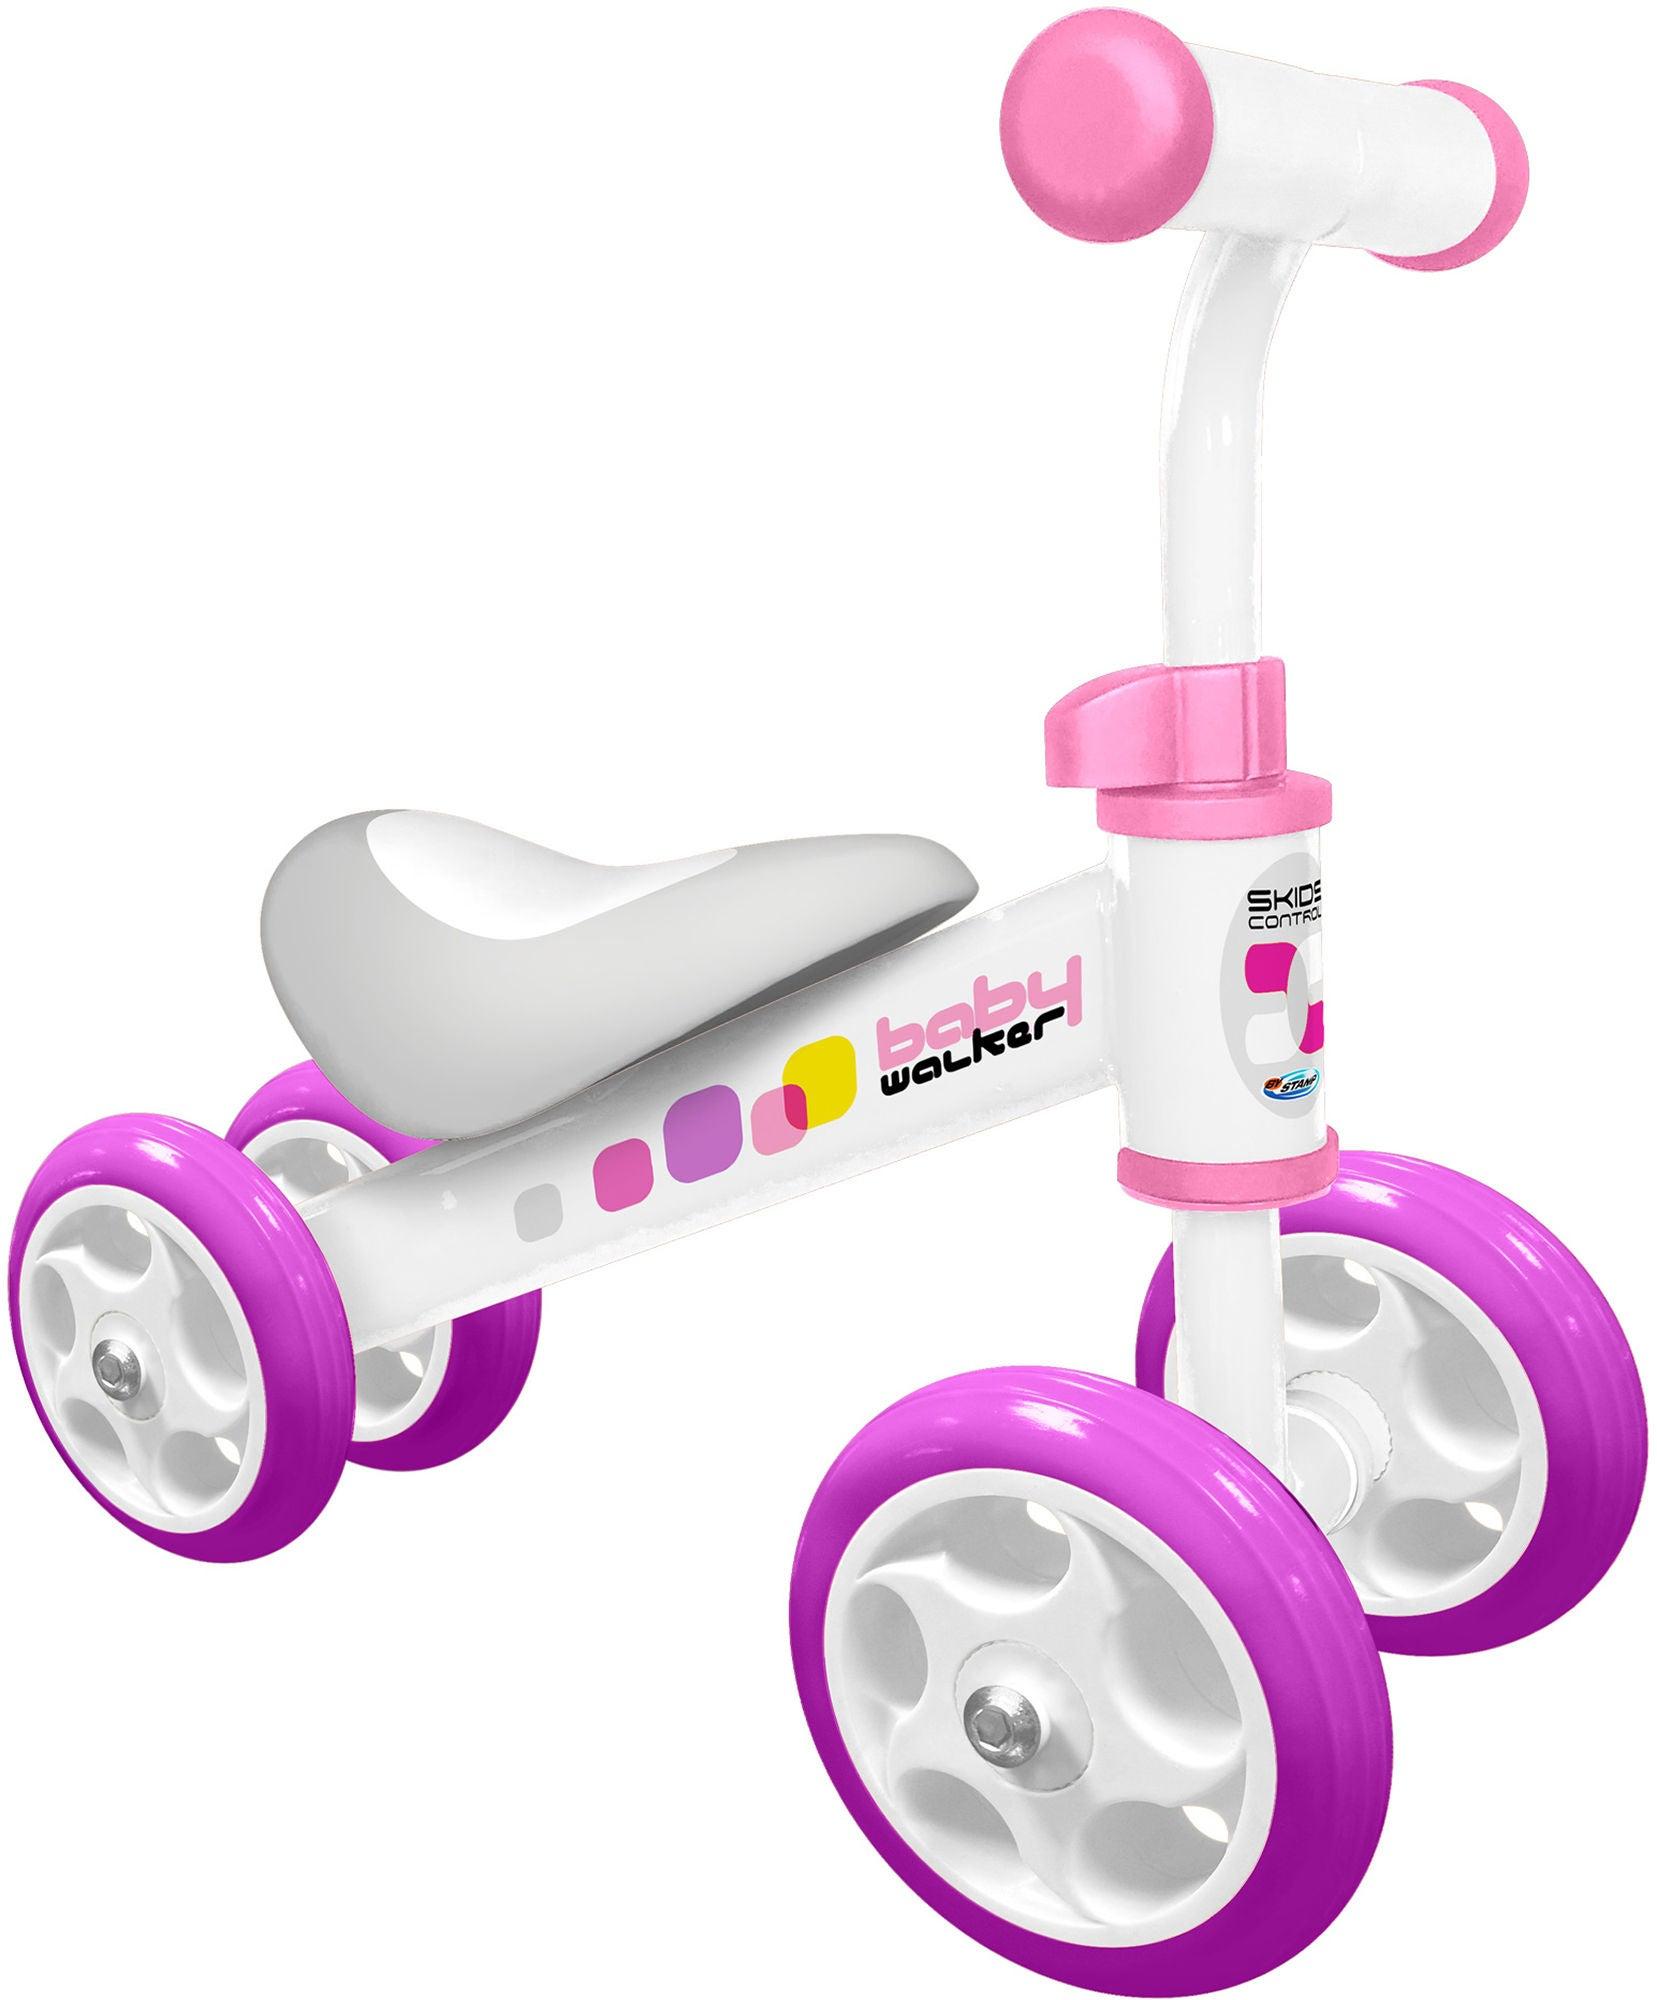 Stamp Springcykel Fyrhjuling, Rosa